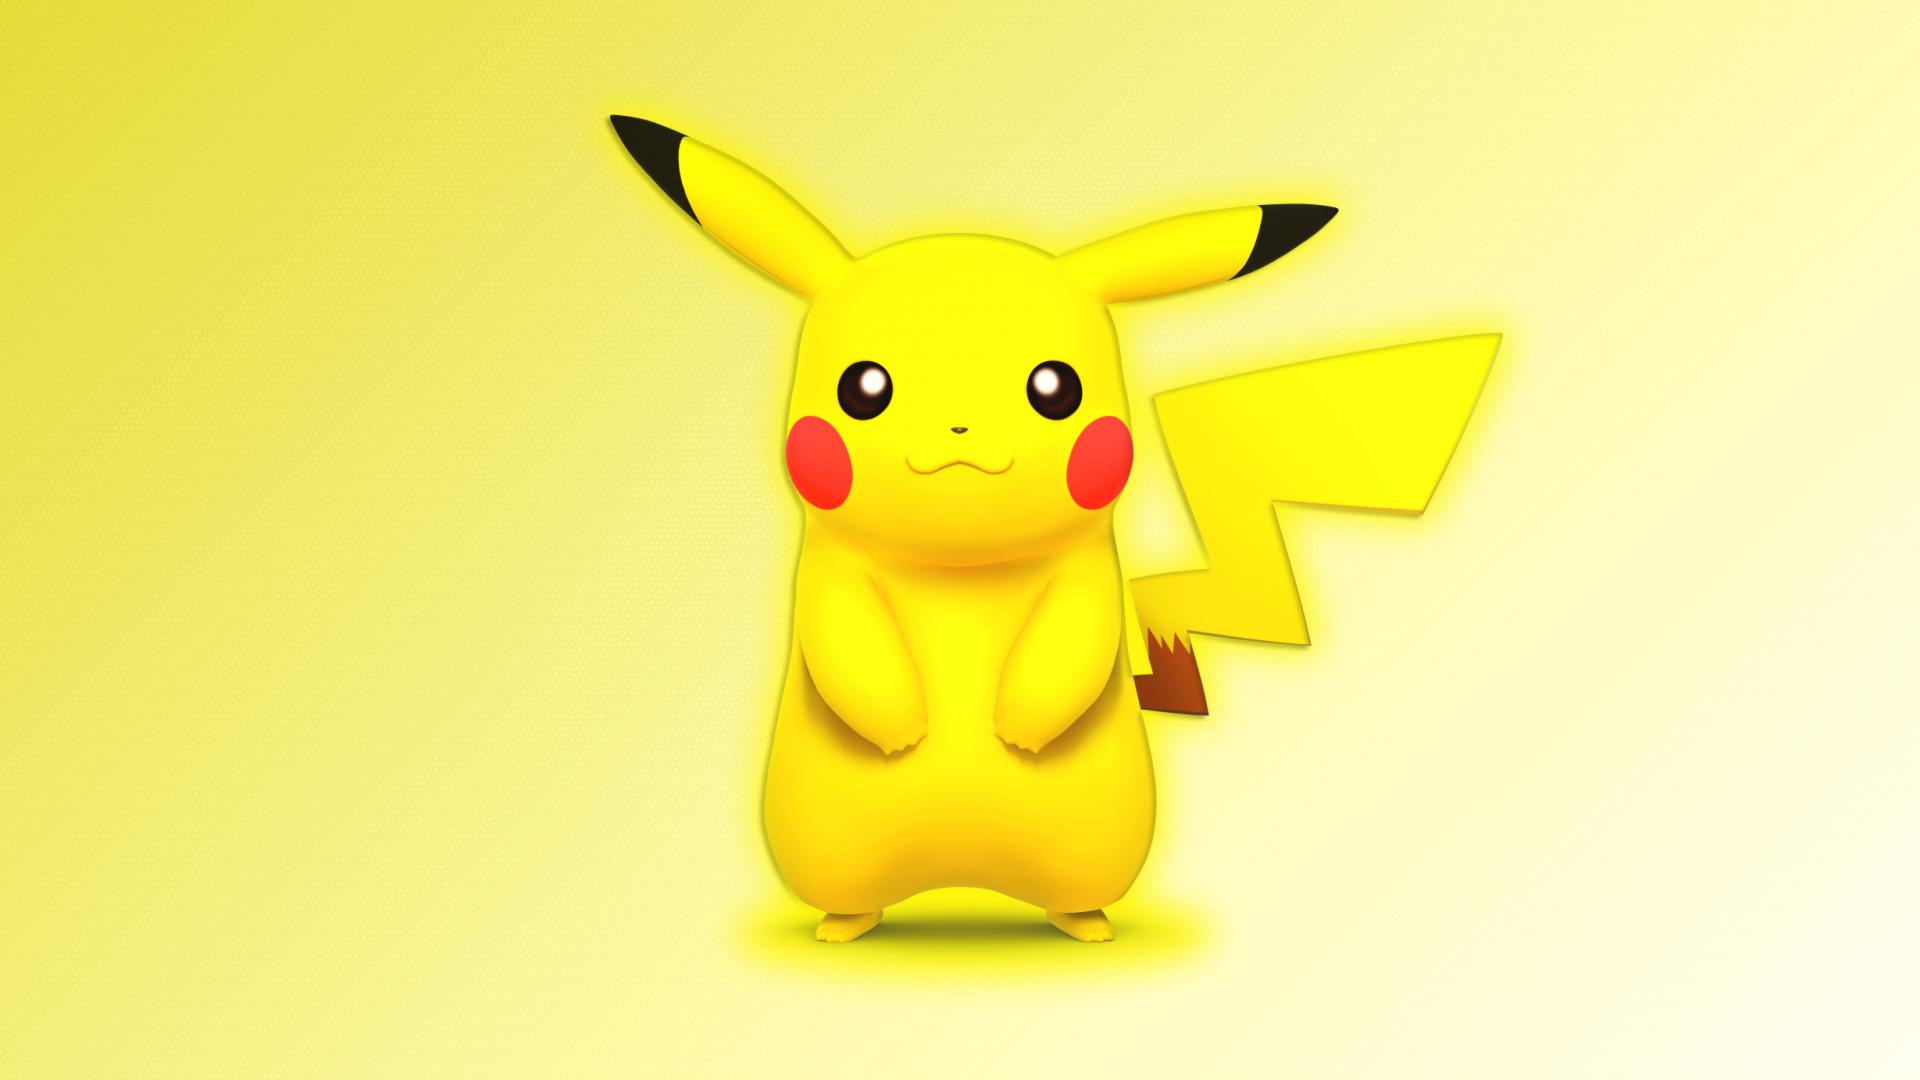 Pikachu Wallpaper 1920x1080 - WallpaperSafari